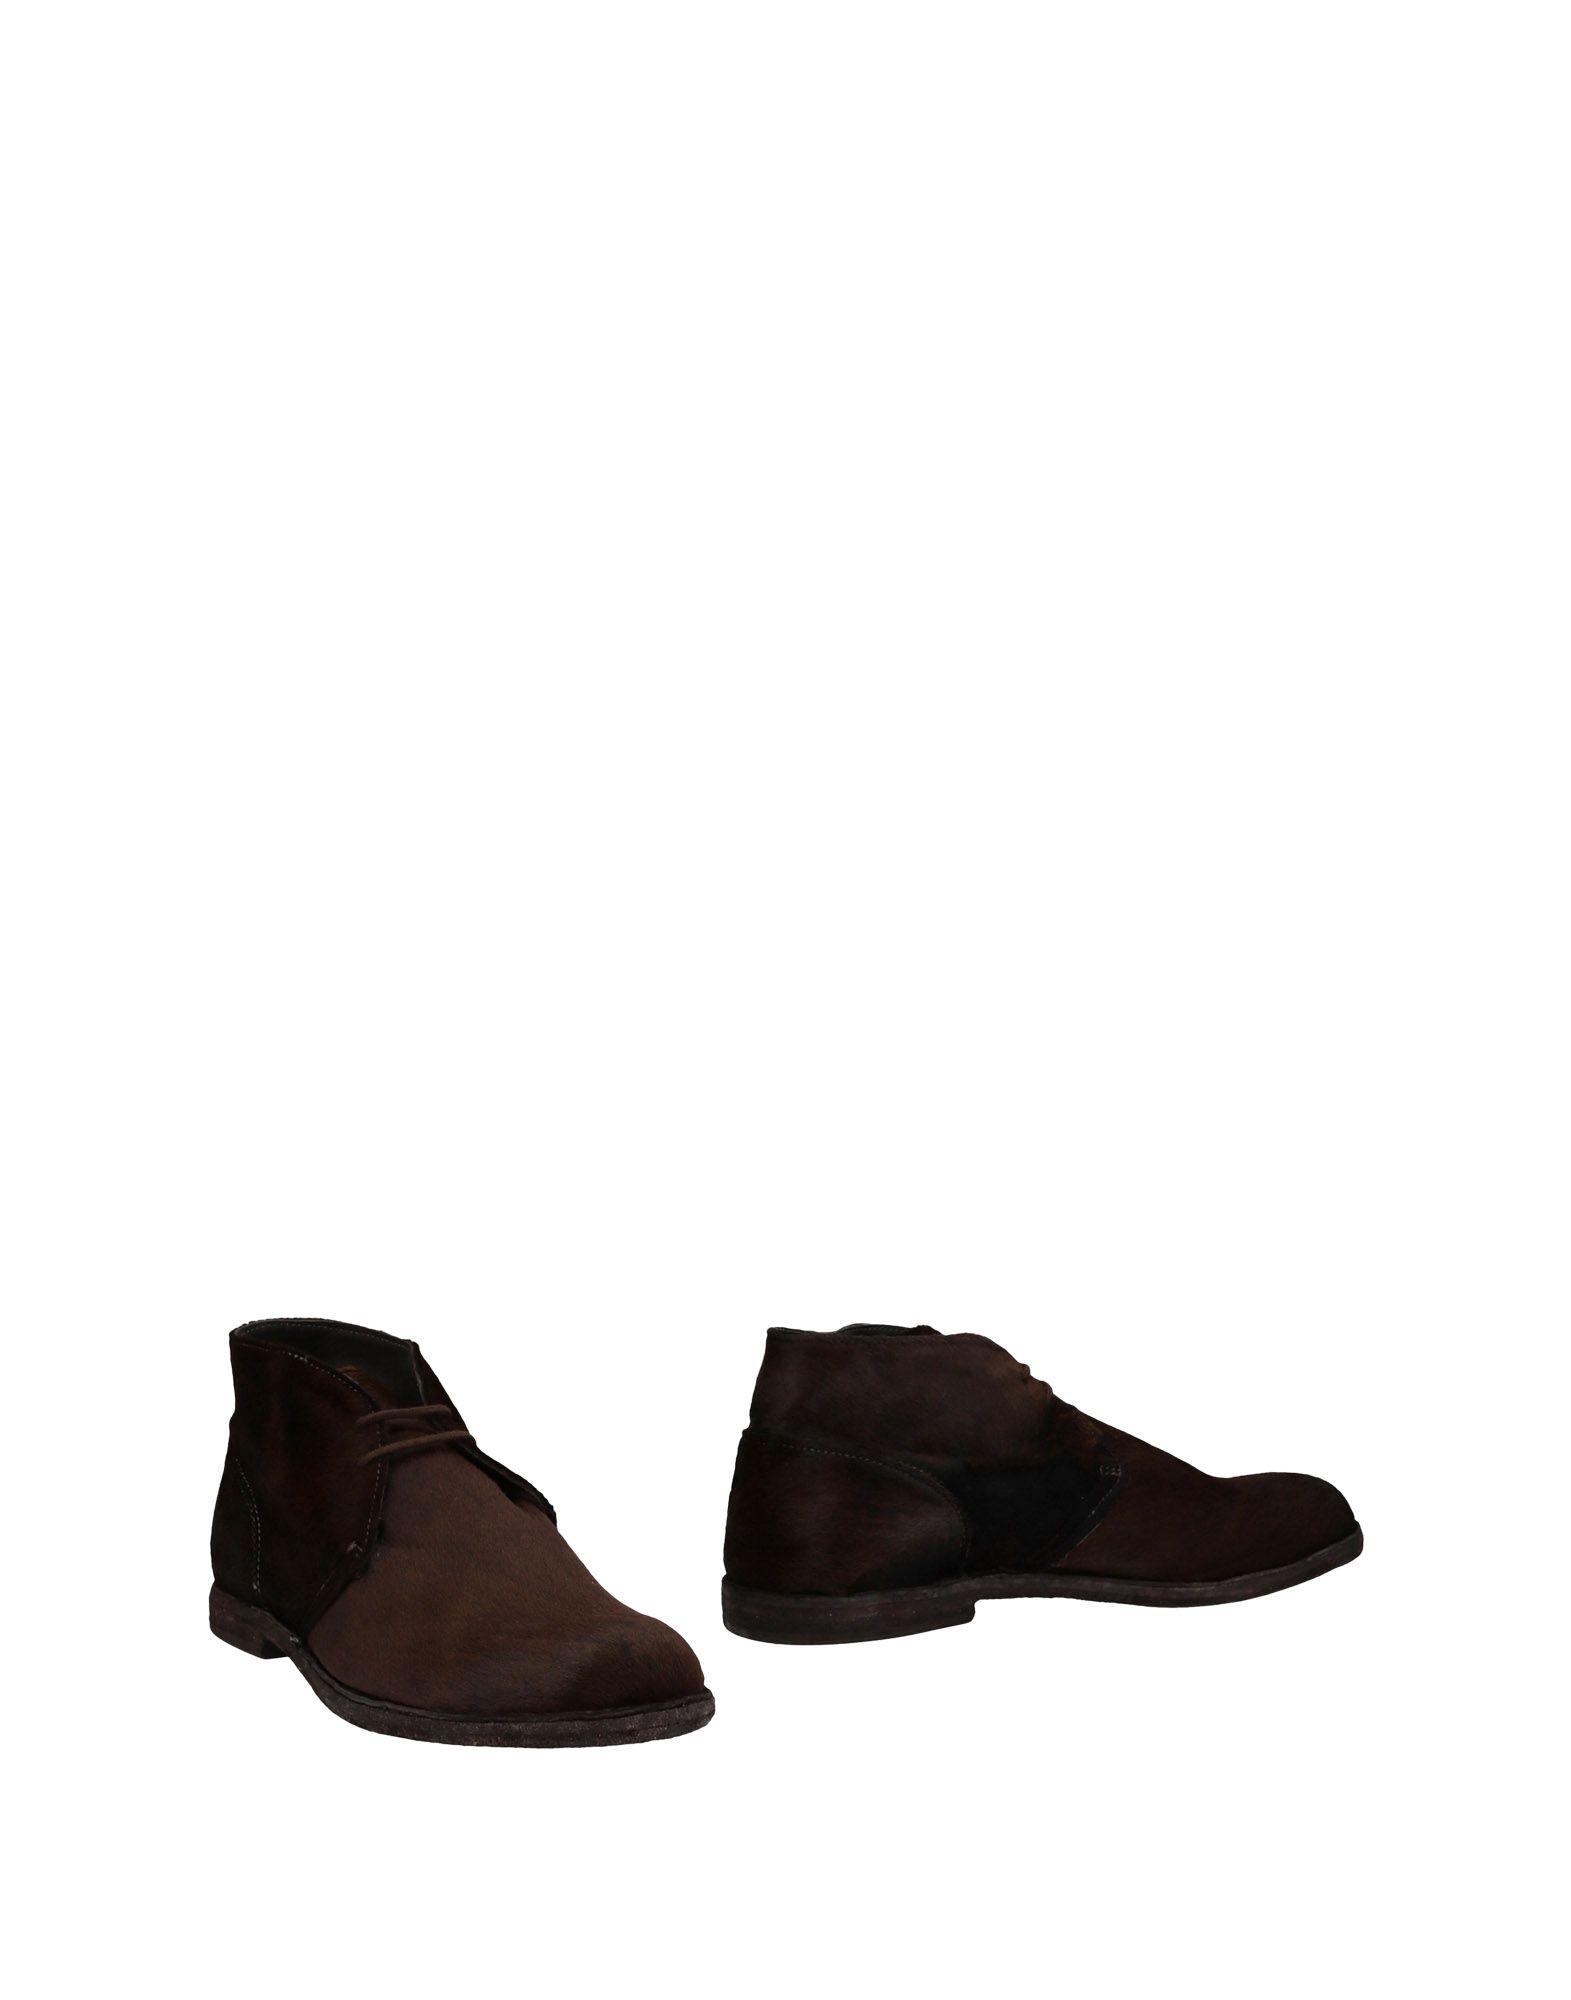 Pantofola D'oro Stiefelette  Herren  Stiefelette 11483945LT 9bec61